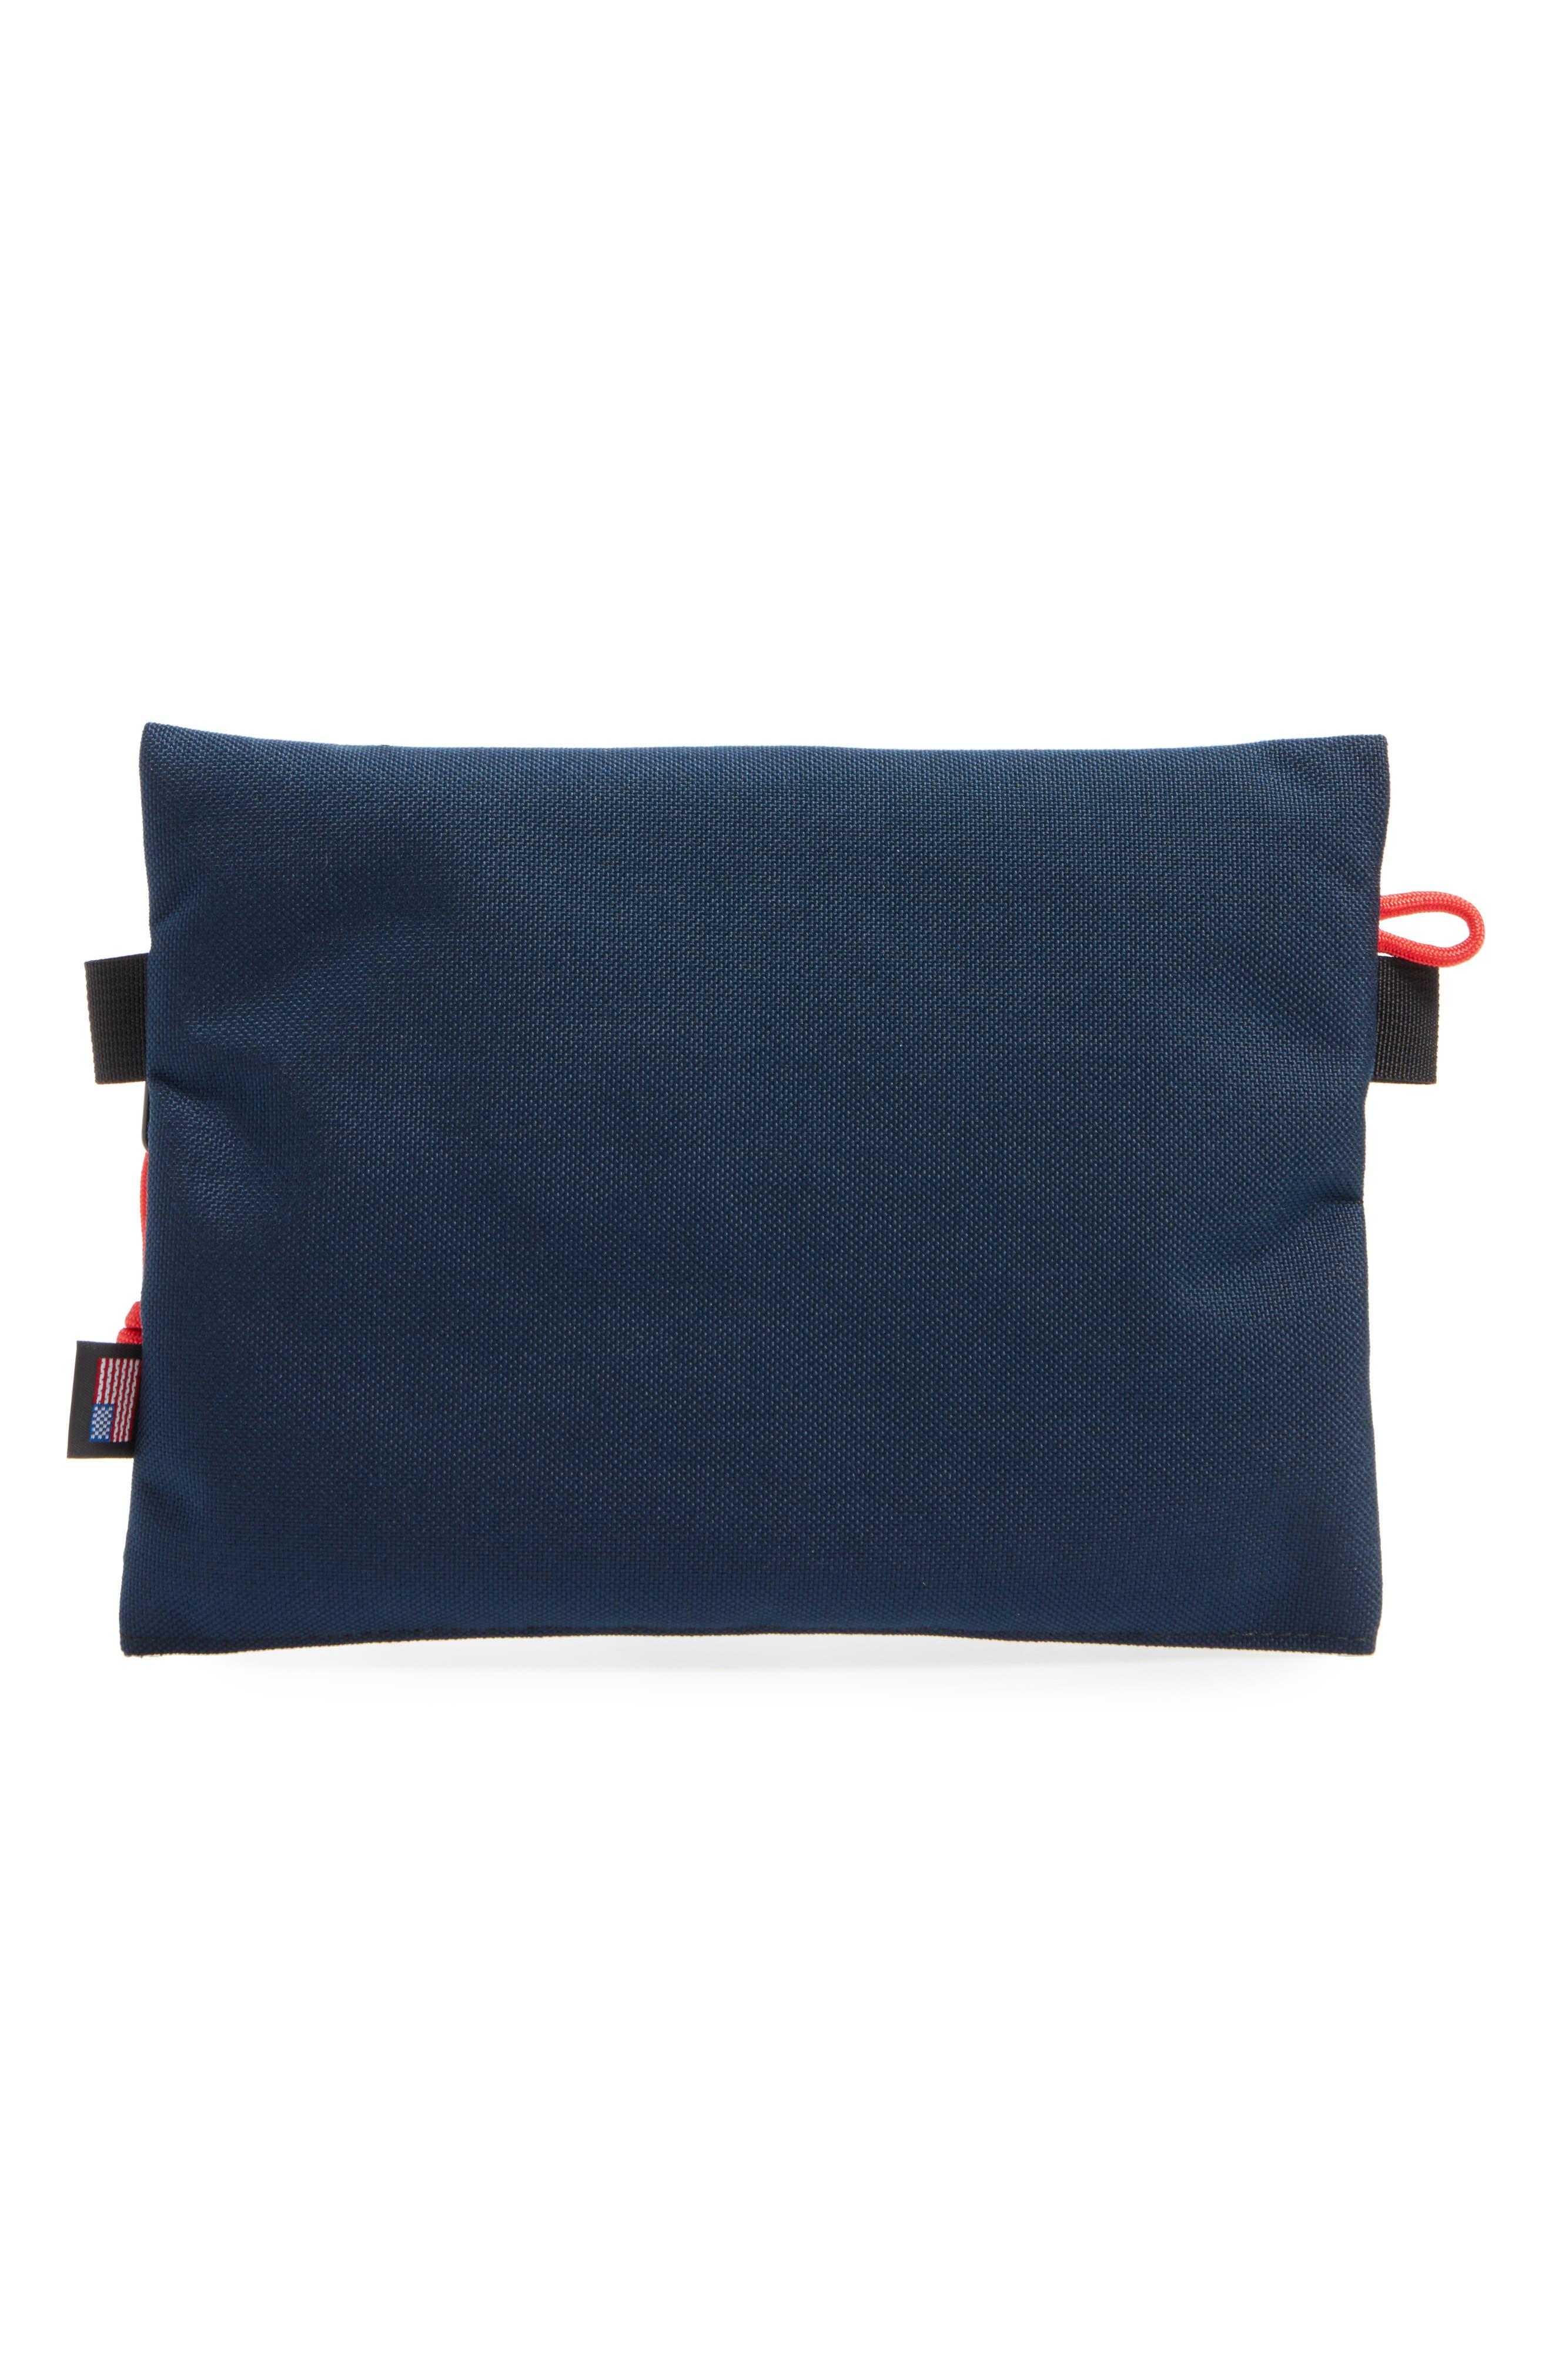 Alternate Image 2  - TopoDesigns Accessory Bag